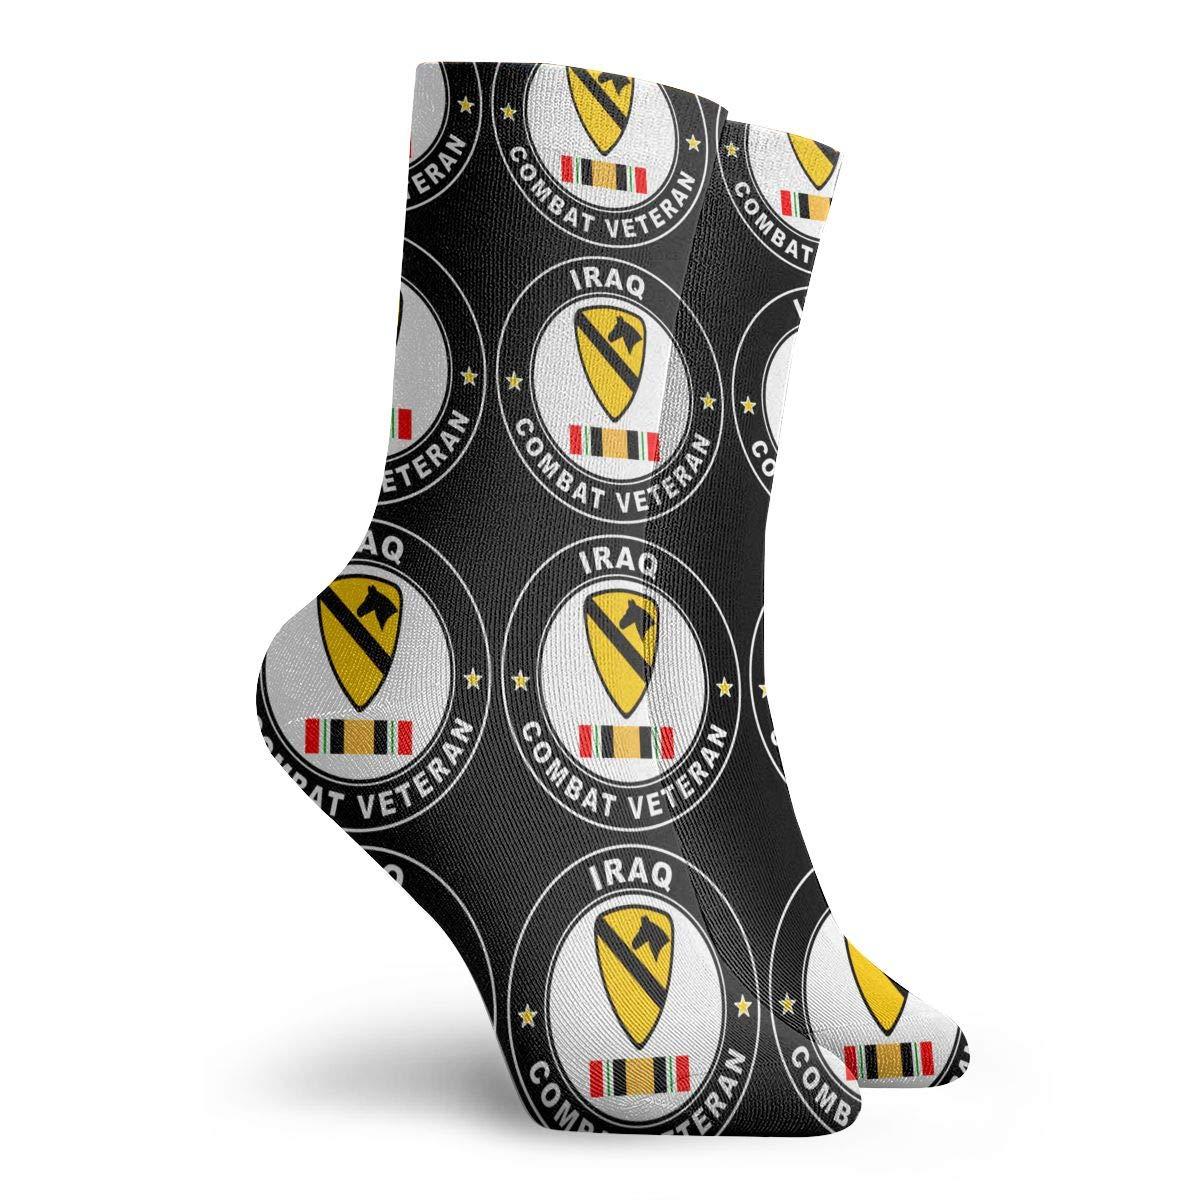 Amazon.com: Calcetines de combate para veteranos del Iraq ...